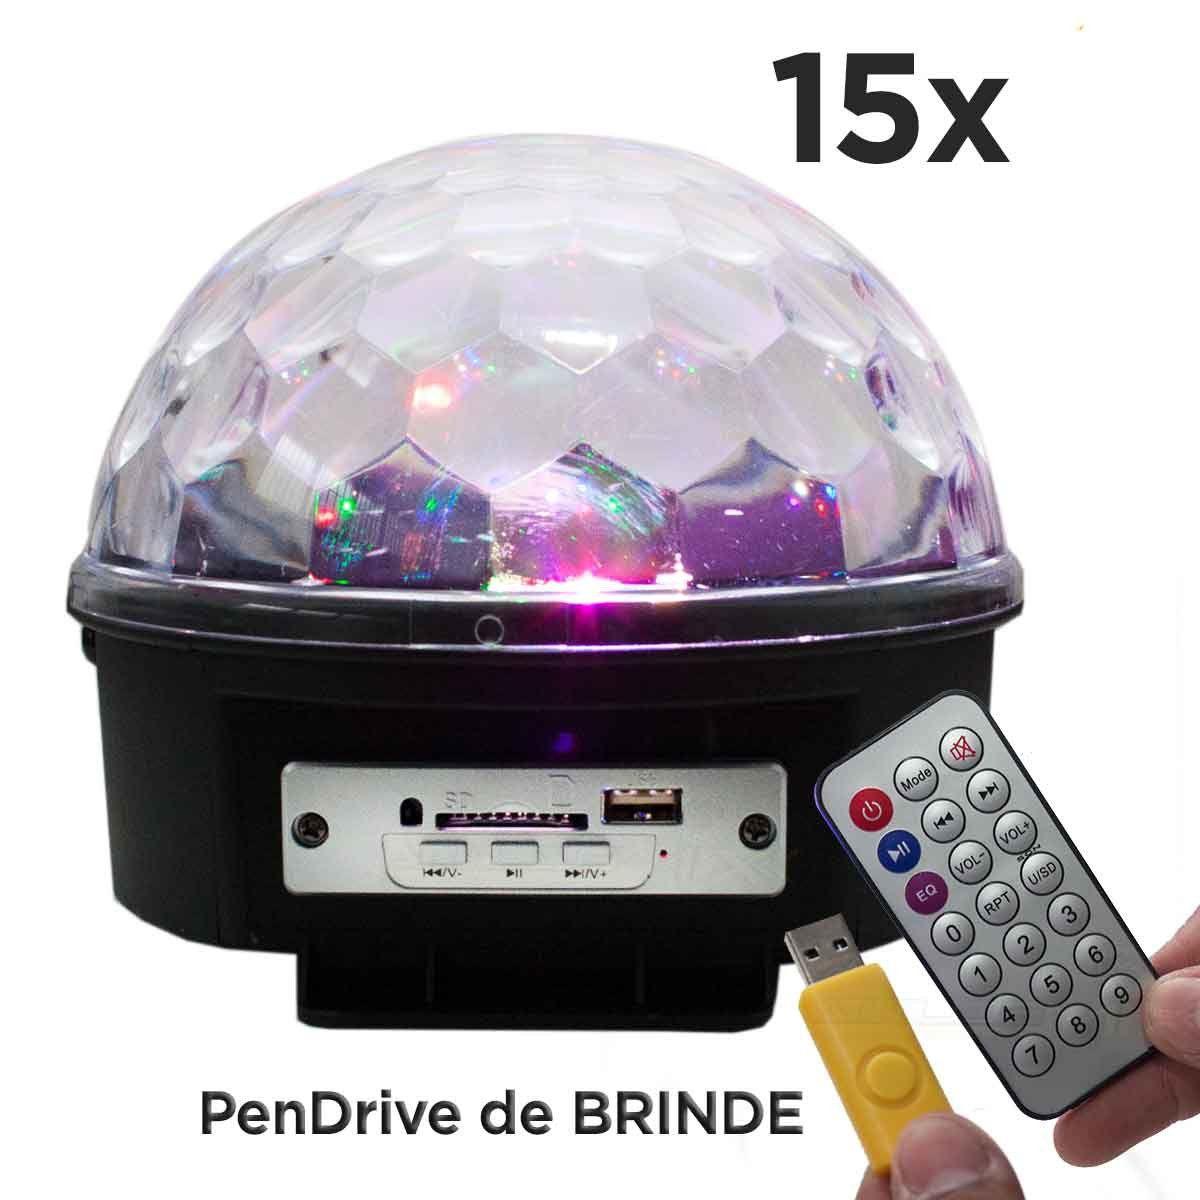 15xGlobo Bola Maluca Led Magic De Cristal Rgb 30w Festas